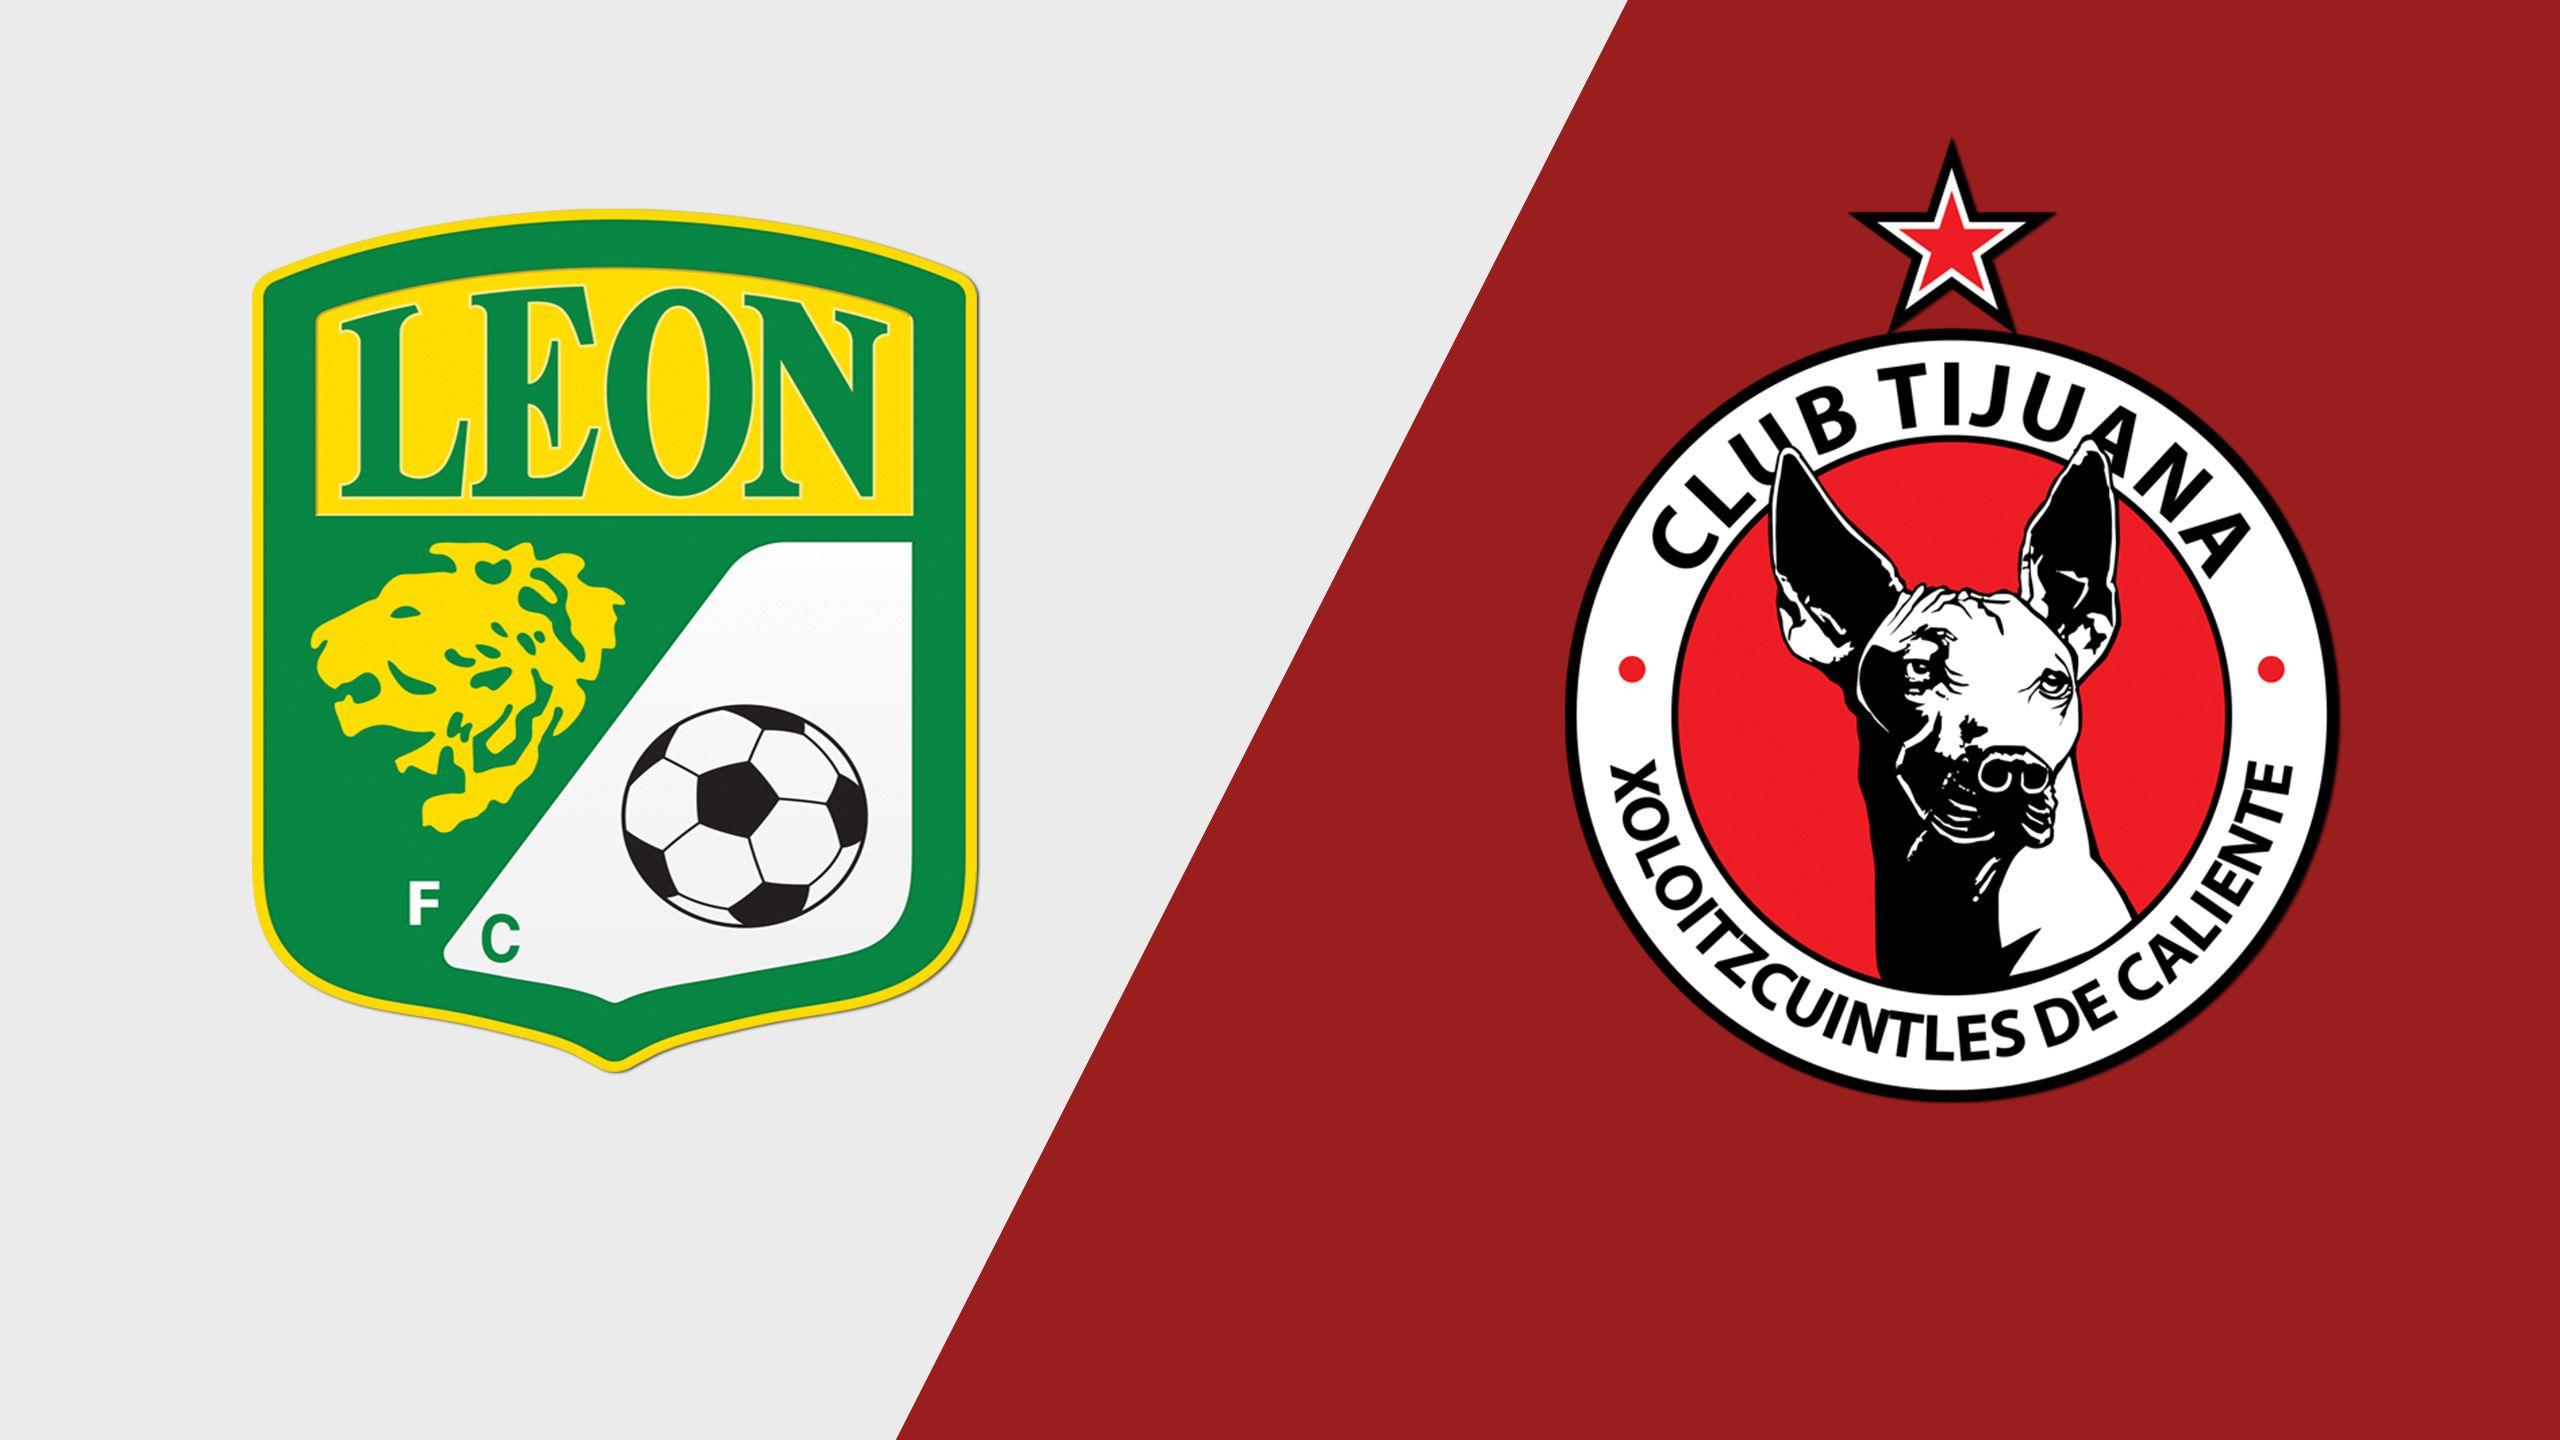 In Spanish - Club León vs. Xolos de Tijuana (Matchday #16) (Liga Bancomer)